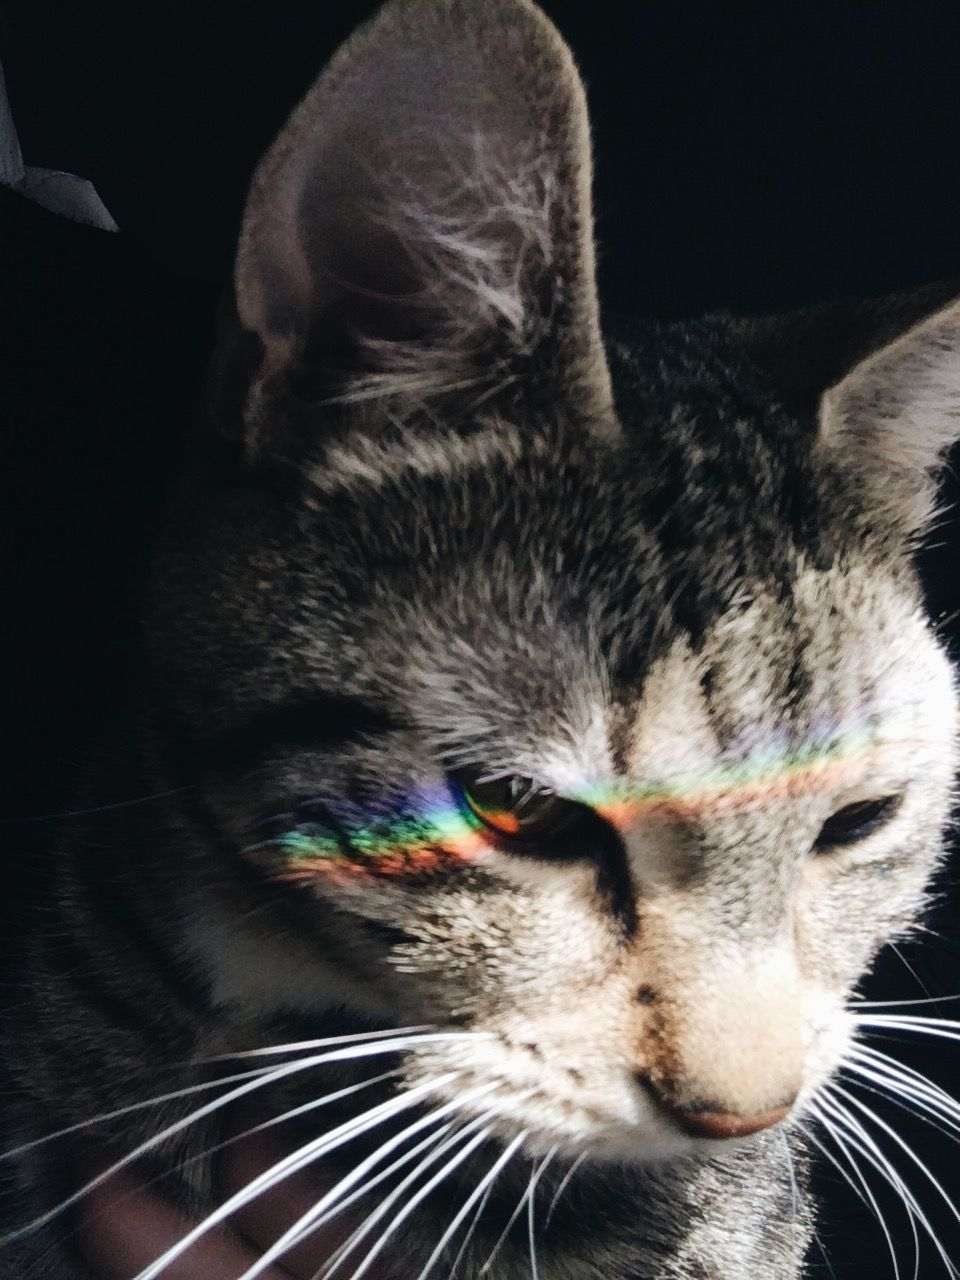 cats, cute, tumblr, aesthetic CatTumblr Cat aesthetic